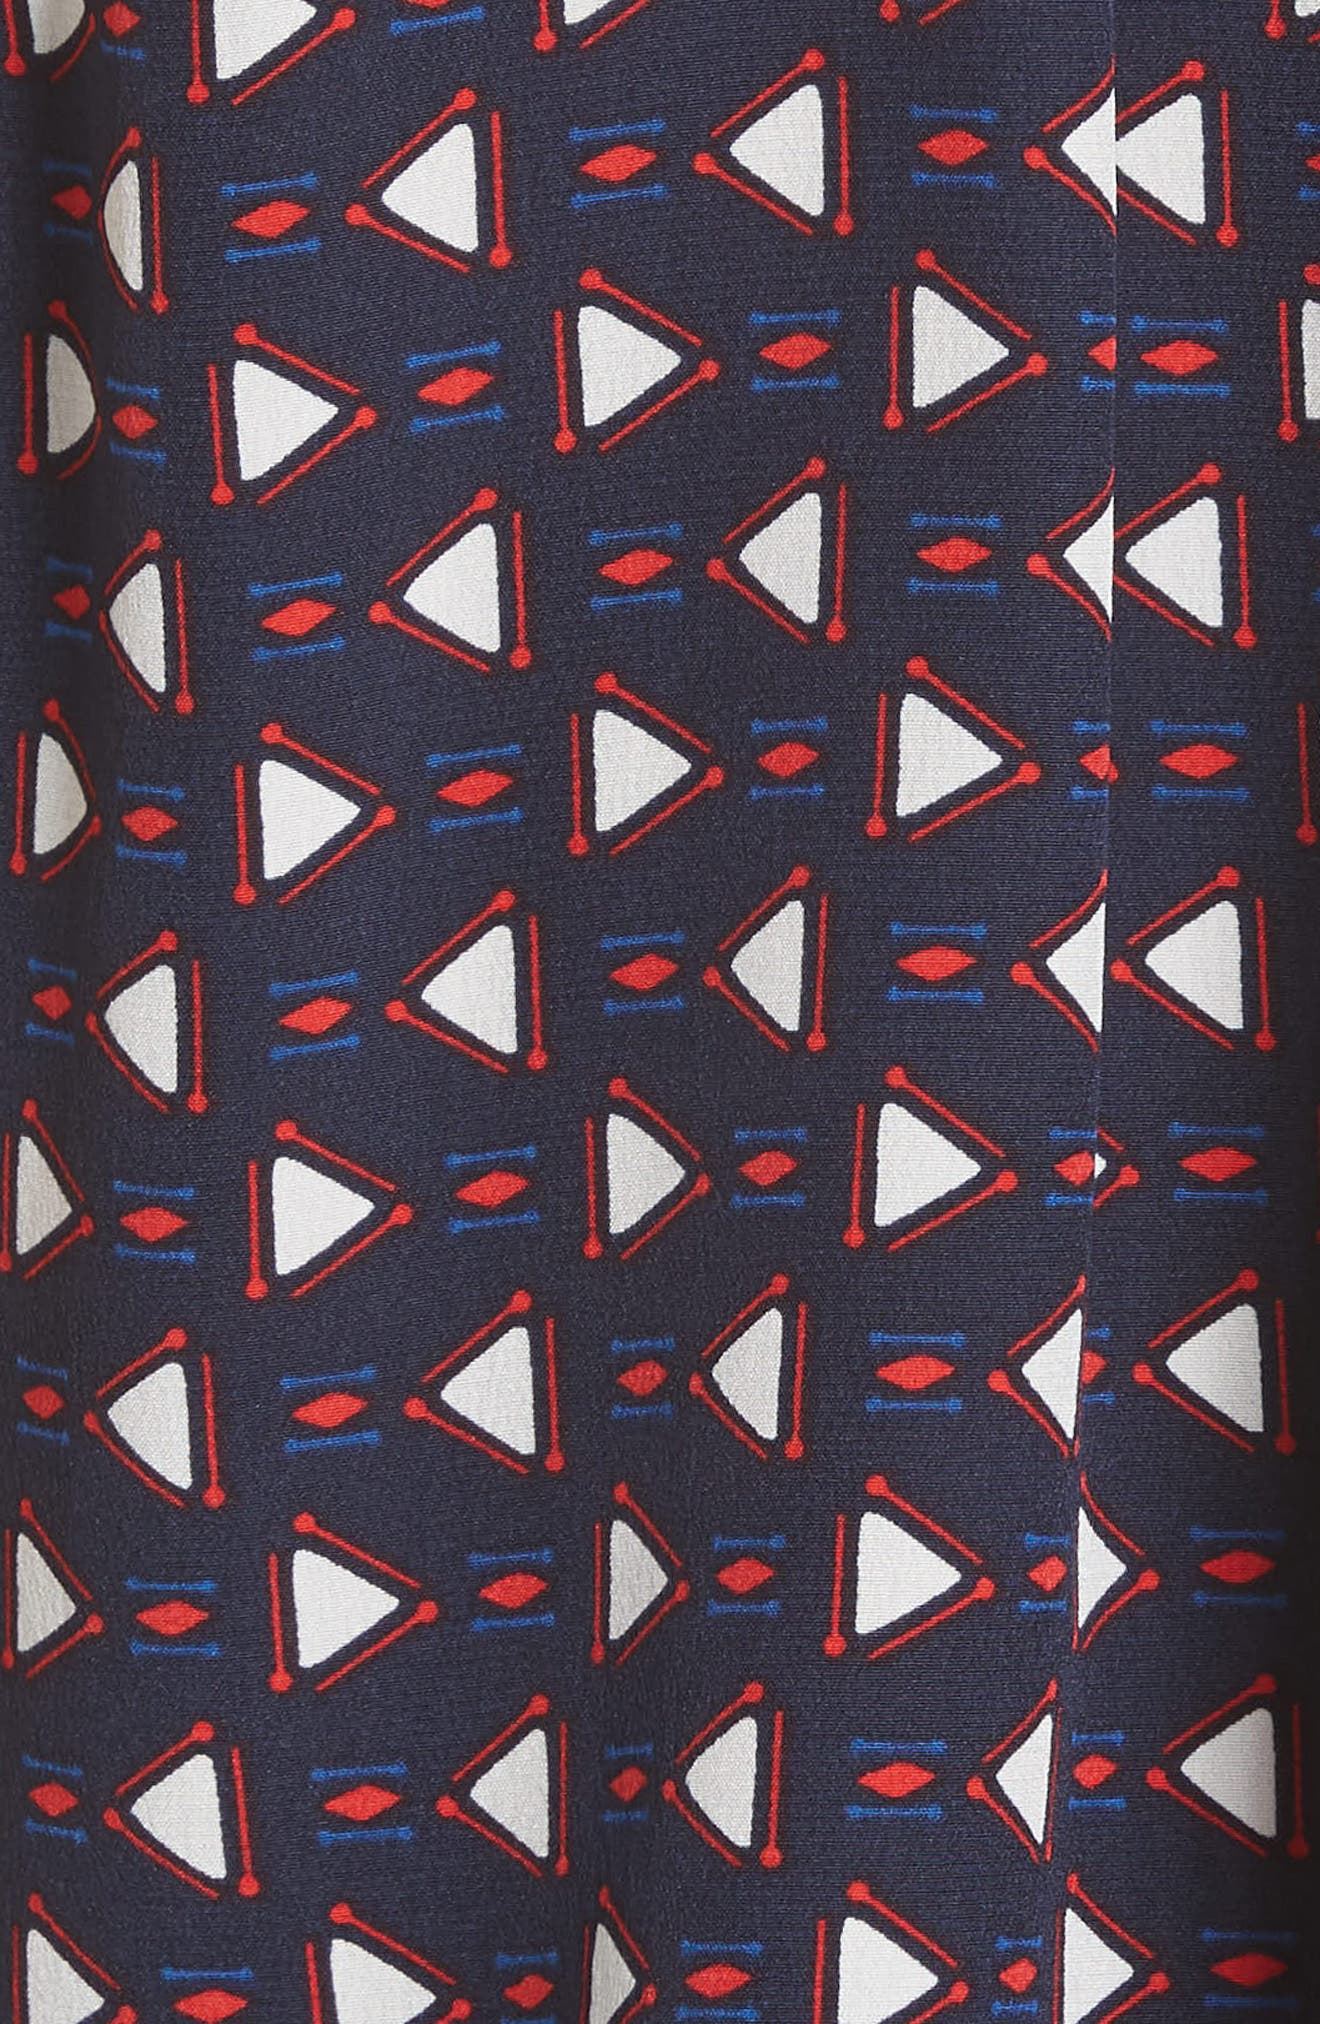 Xandry B Silk Top,                             Alternate thumbnail 3, color,                             Dark Navy